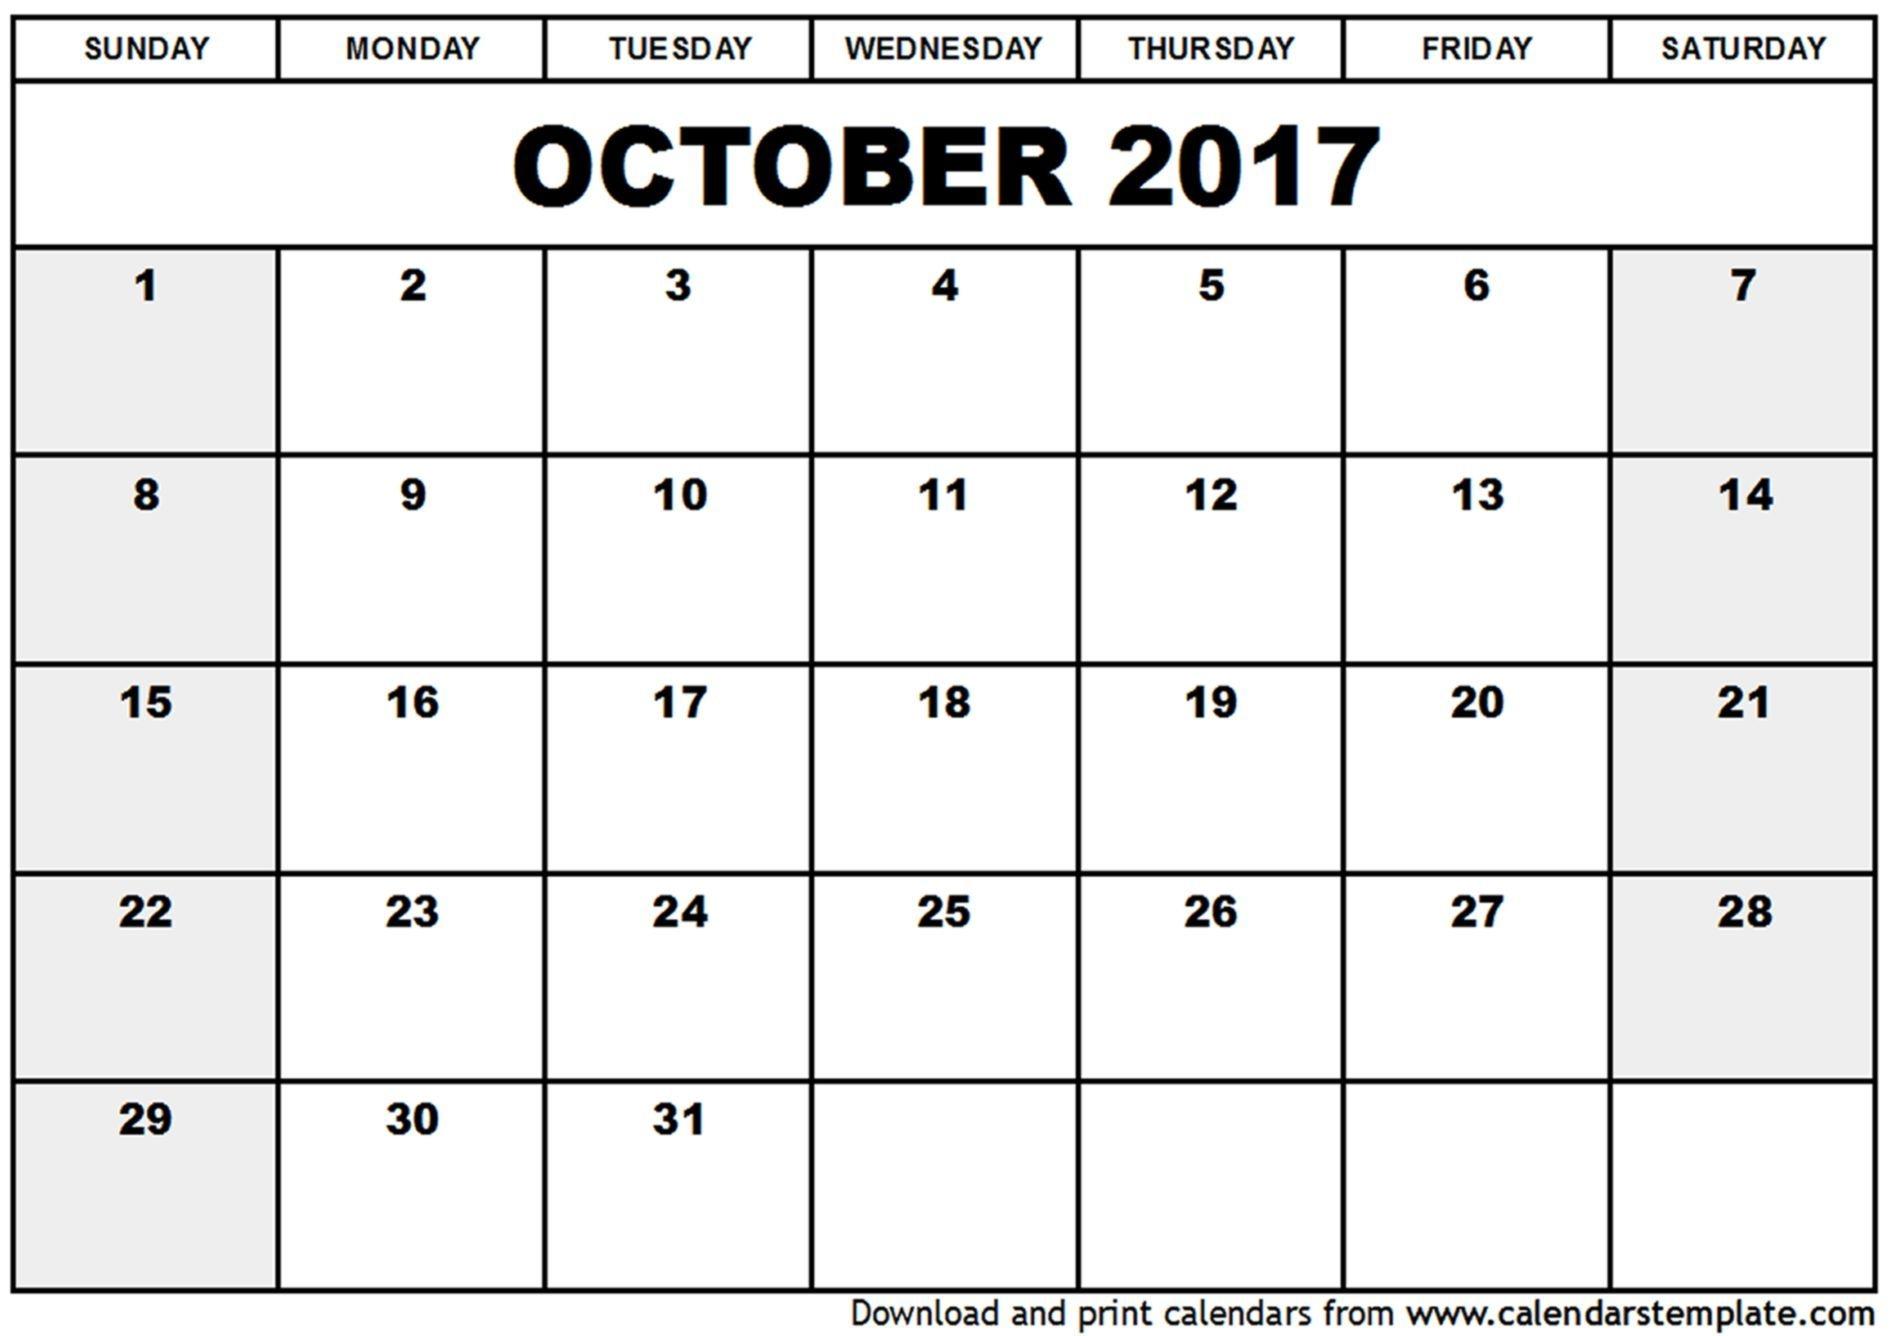 Blank Calendar 2017 October Calendar - Yahoo Image Search